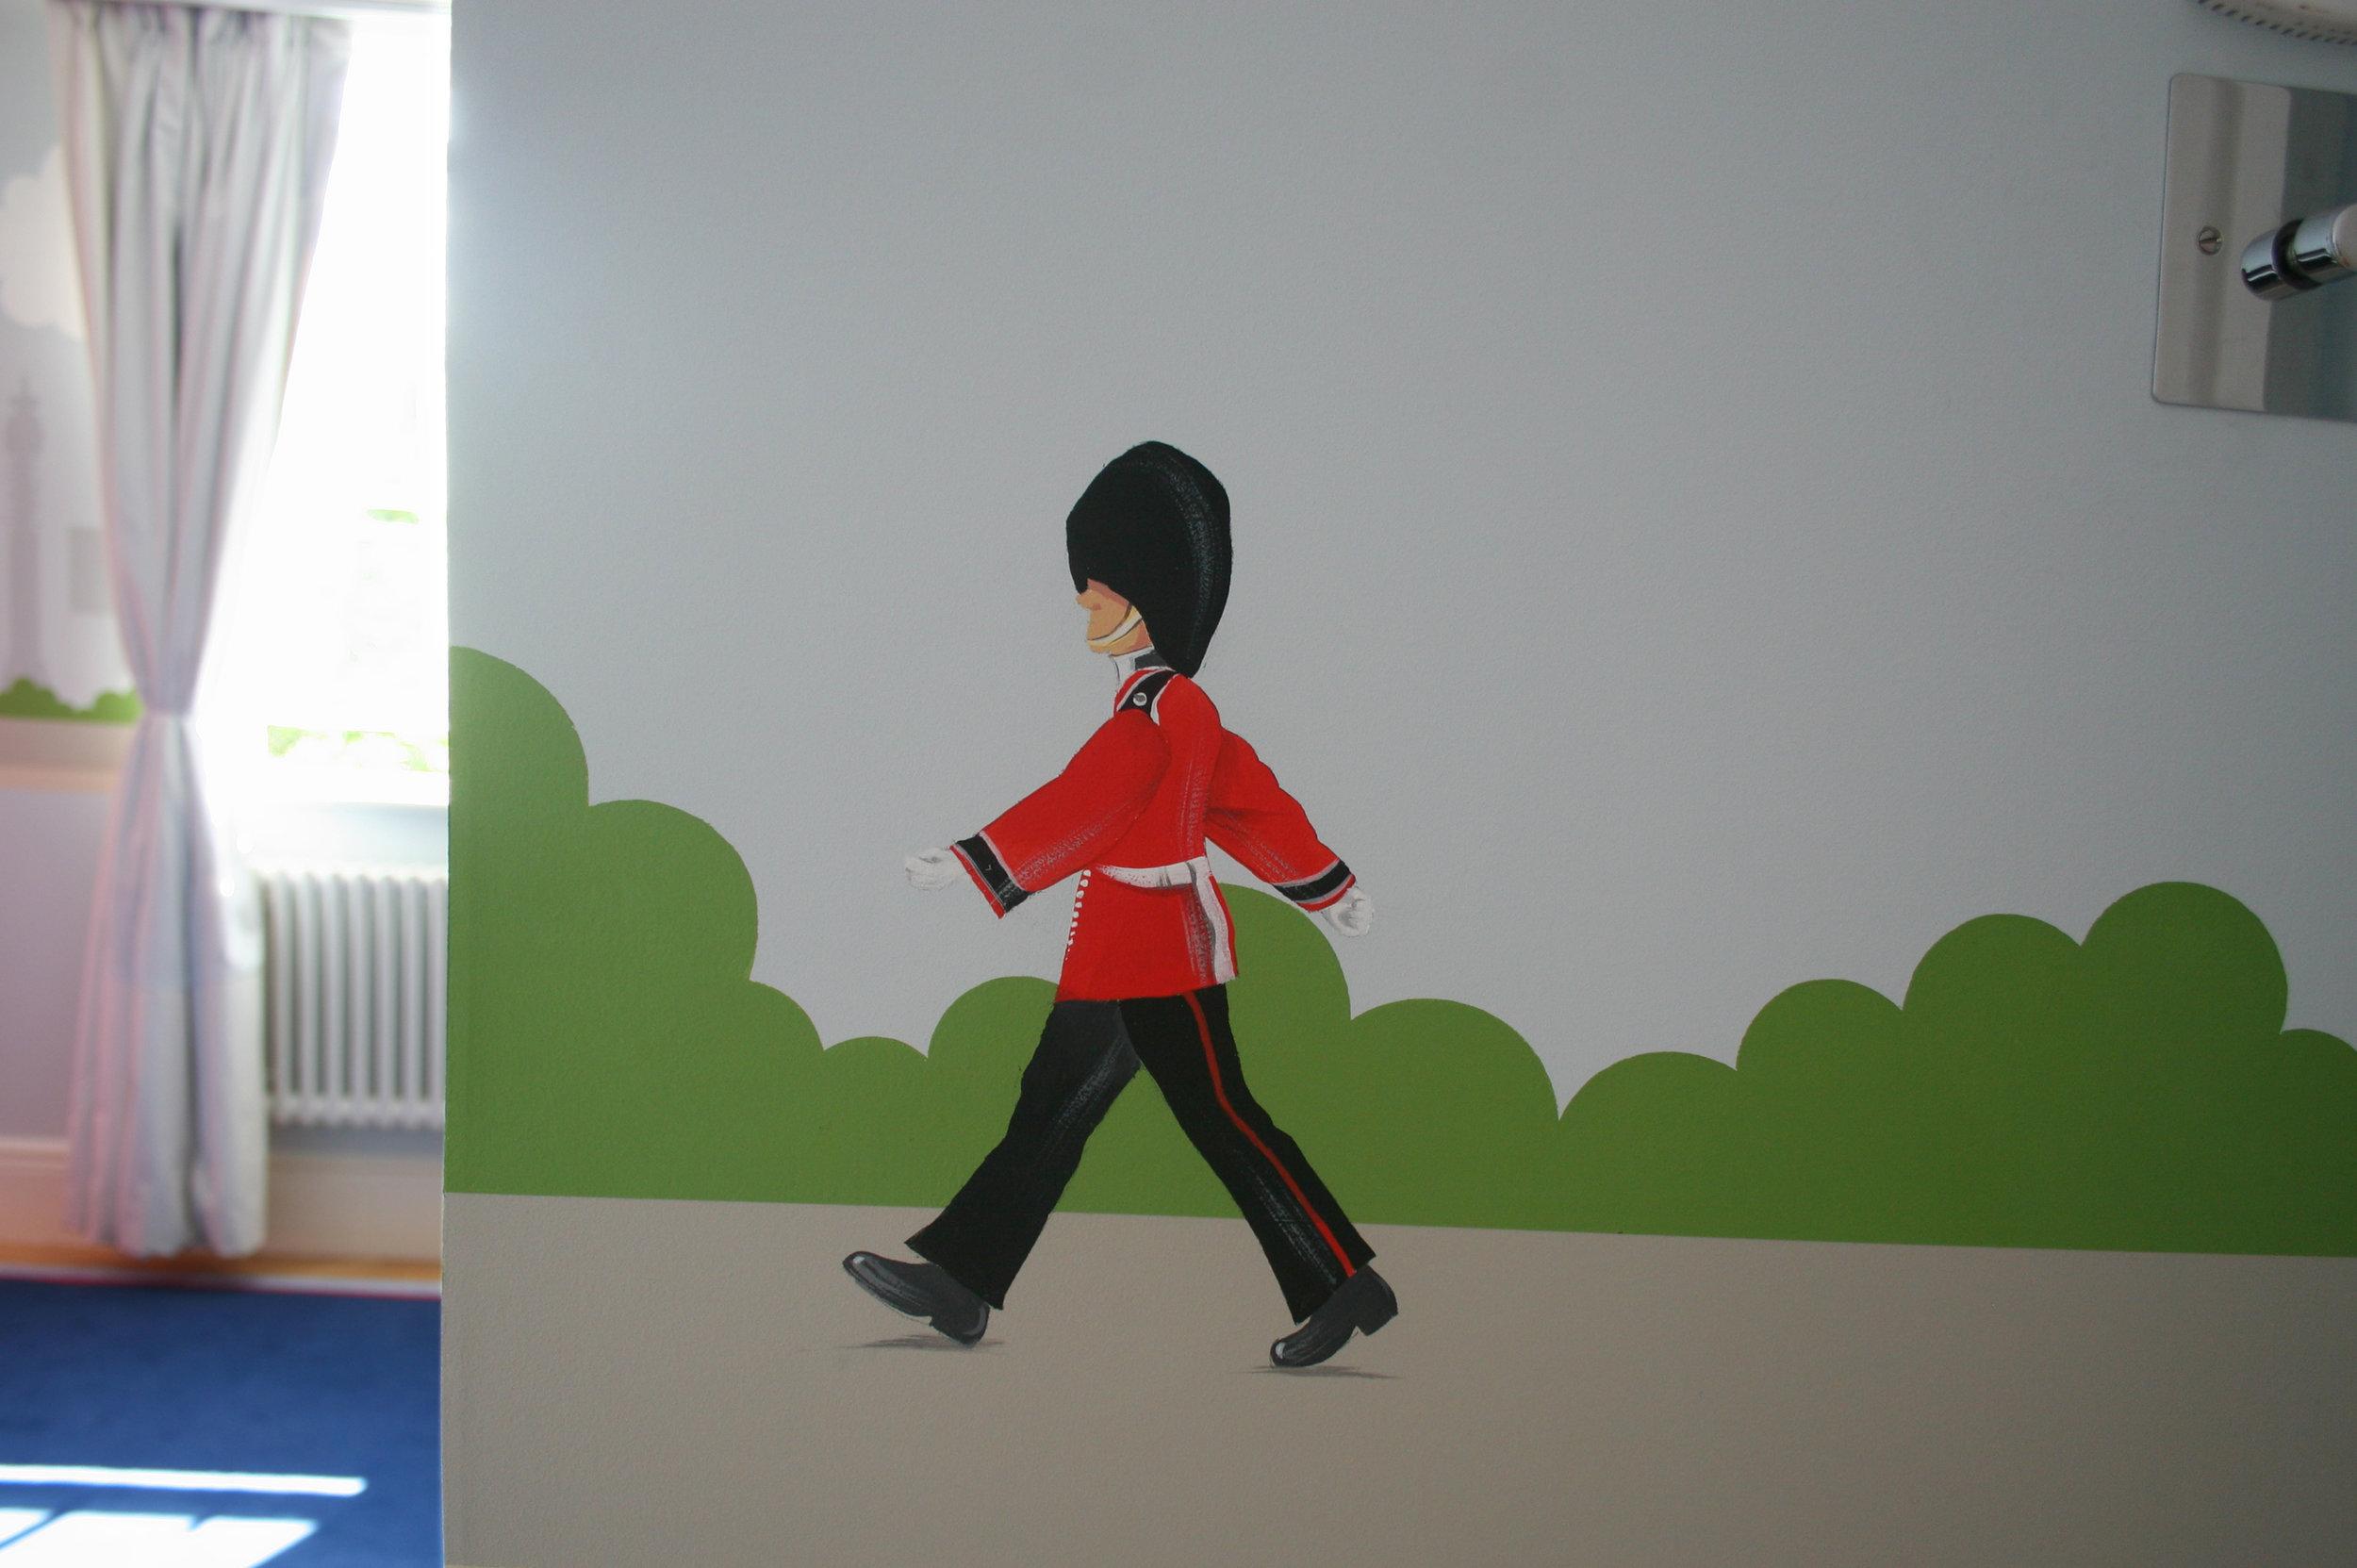 london_mural_5.jpg